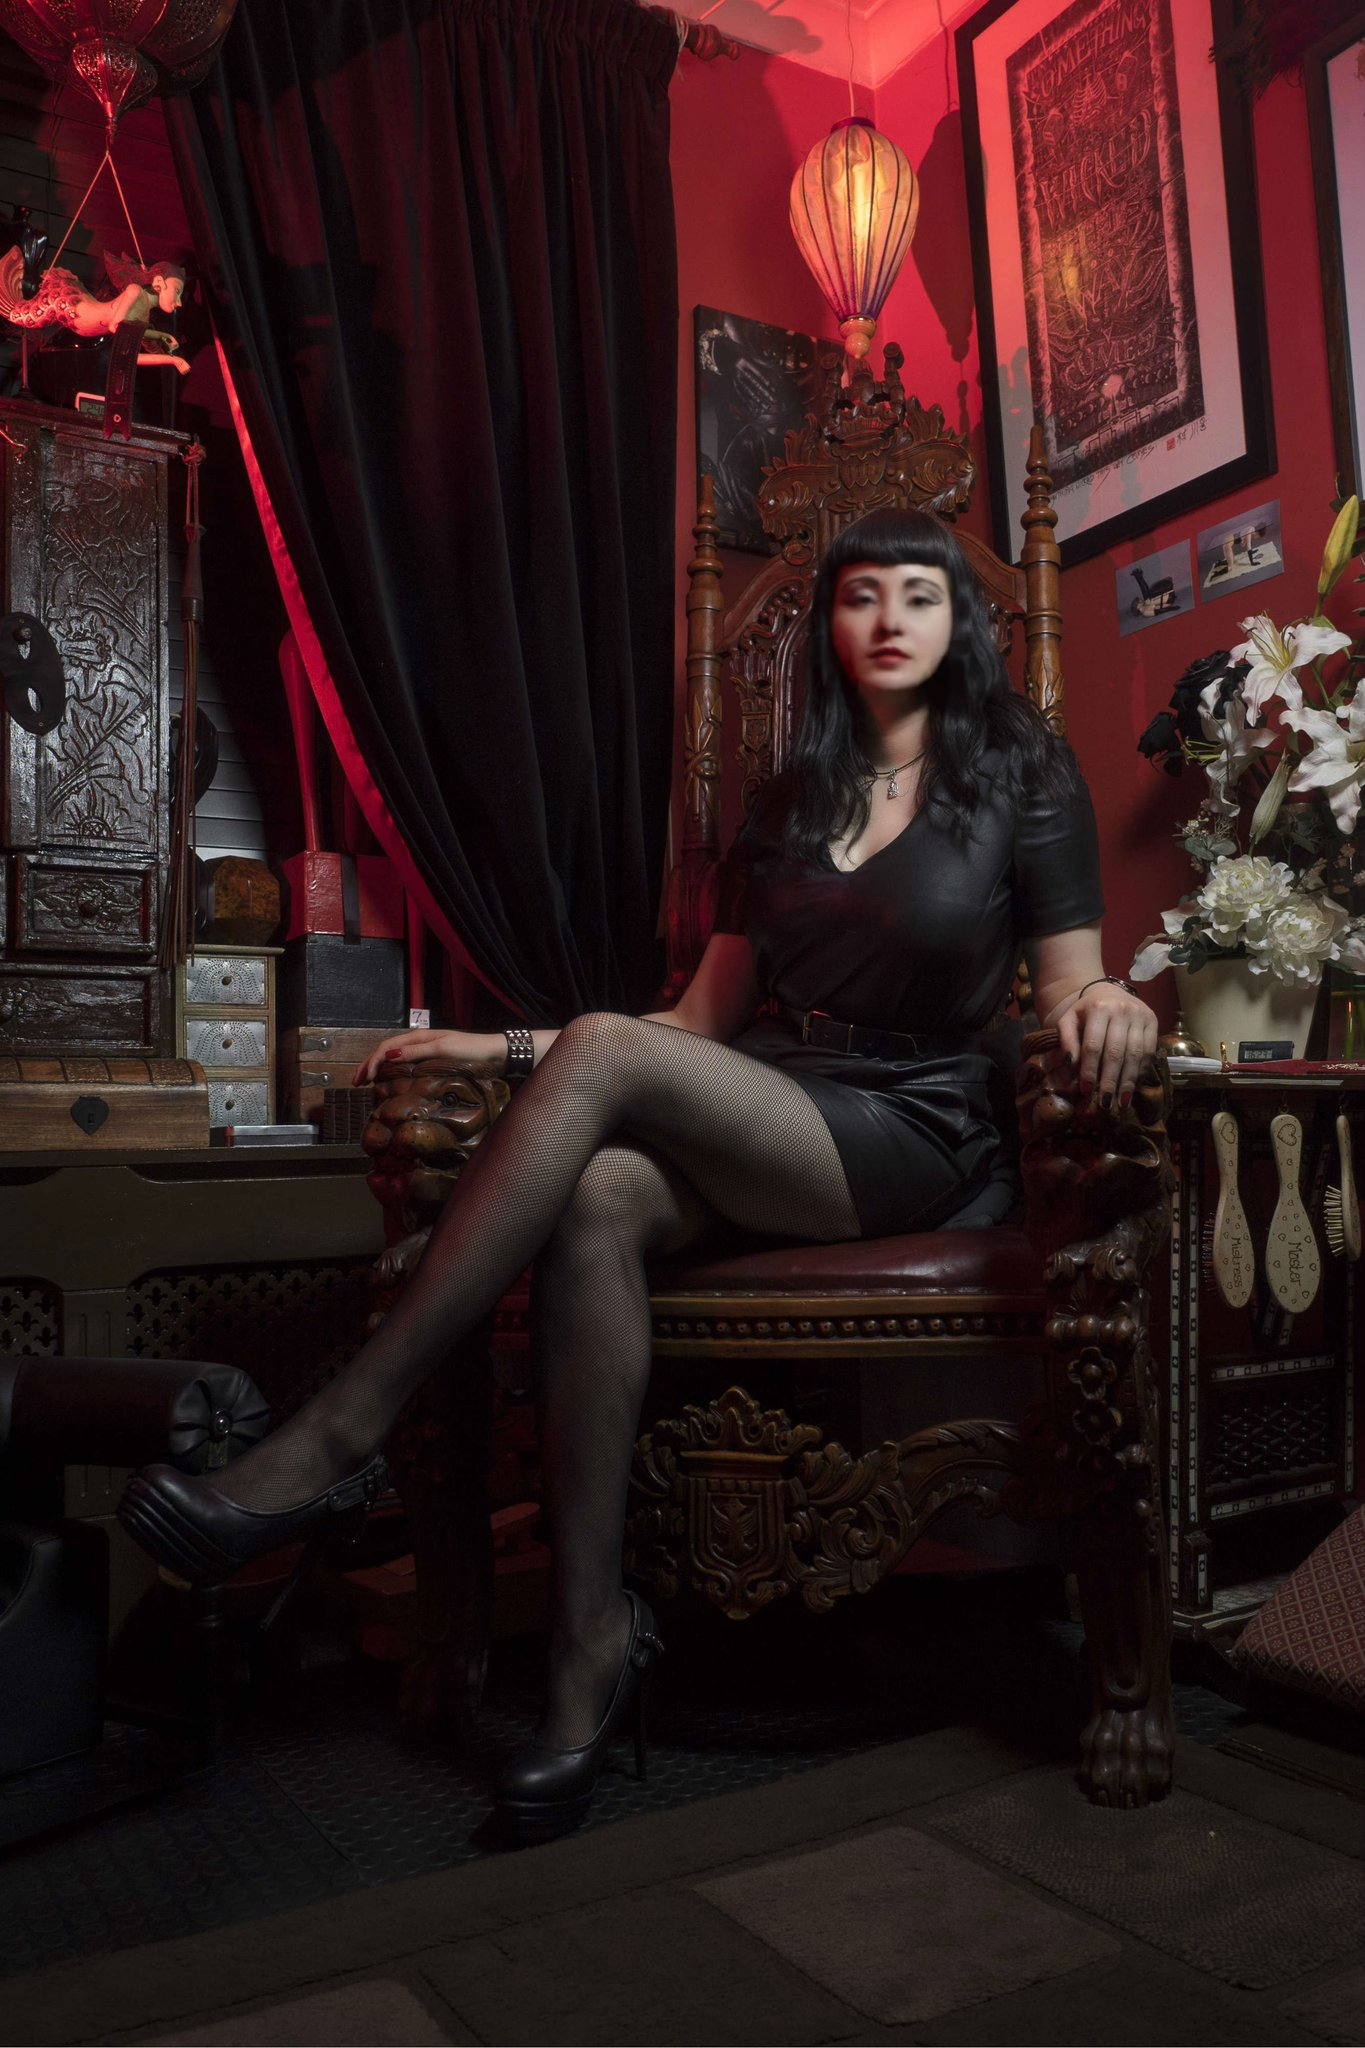 london-mistresses-mistress-bettie-von-sade